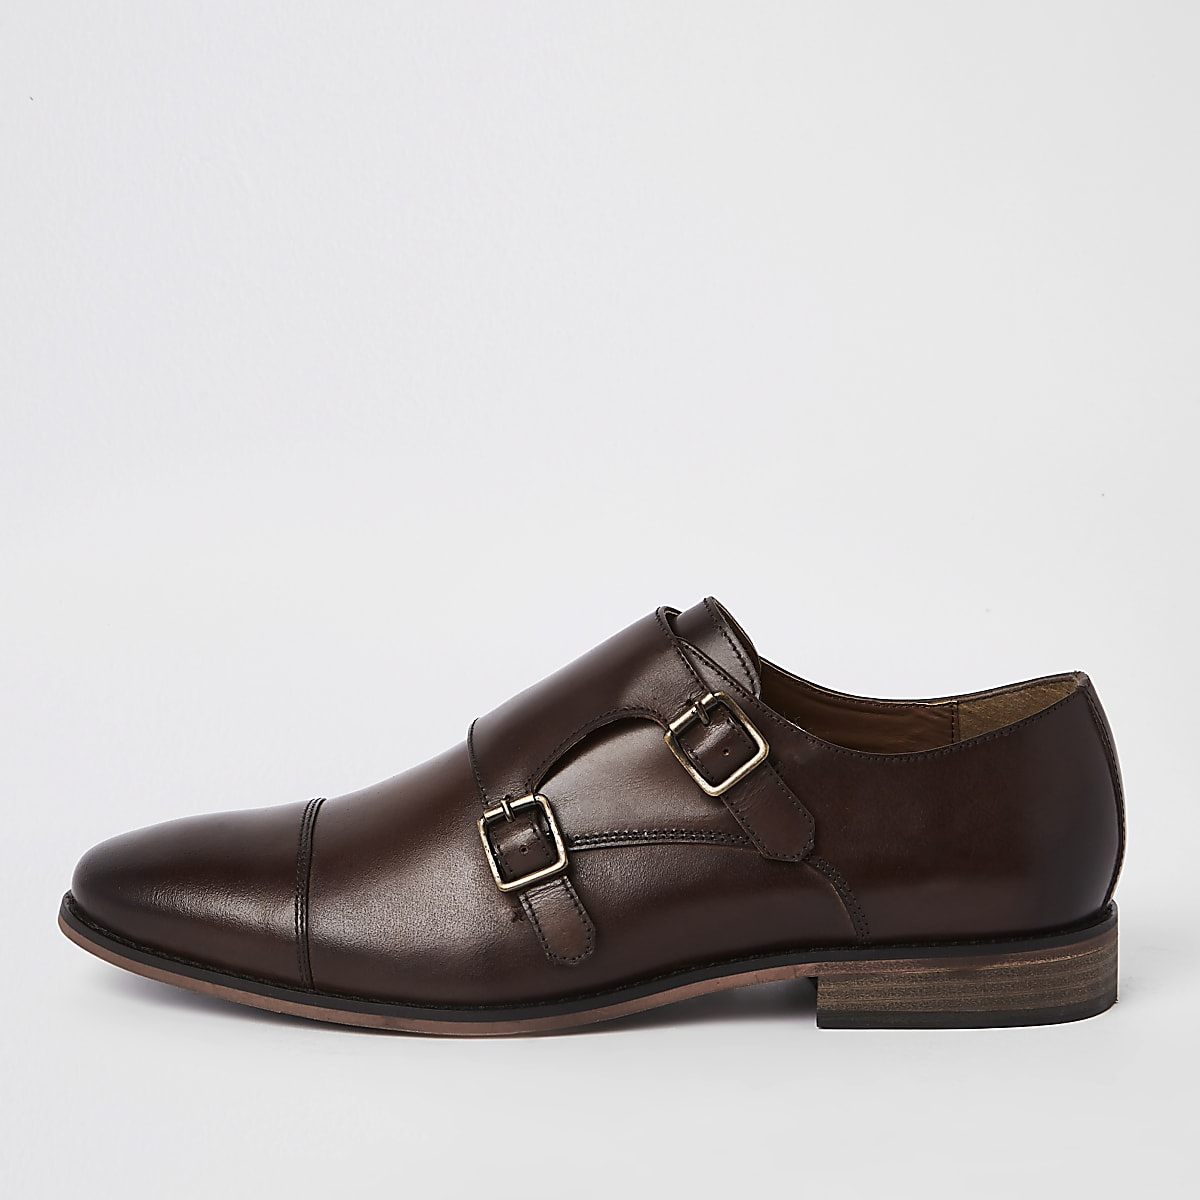 Donkerbruine derbyschoenen met dubbele gesp